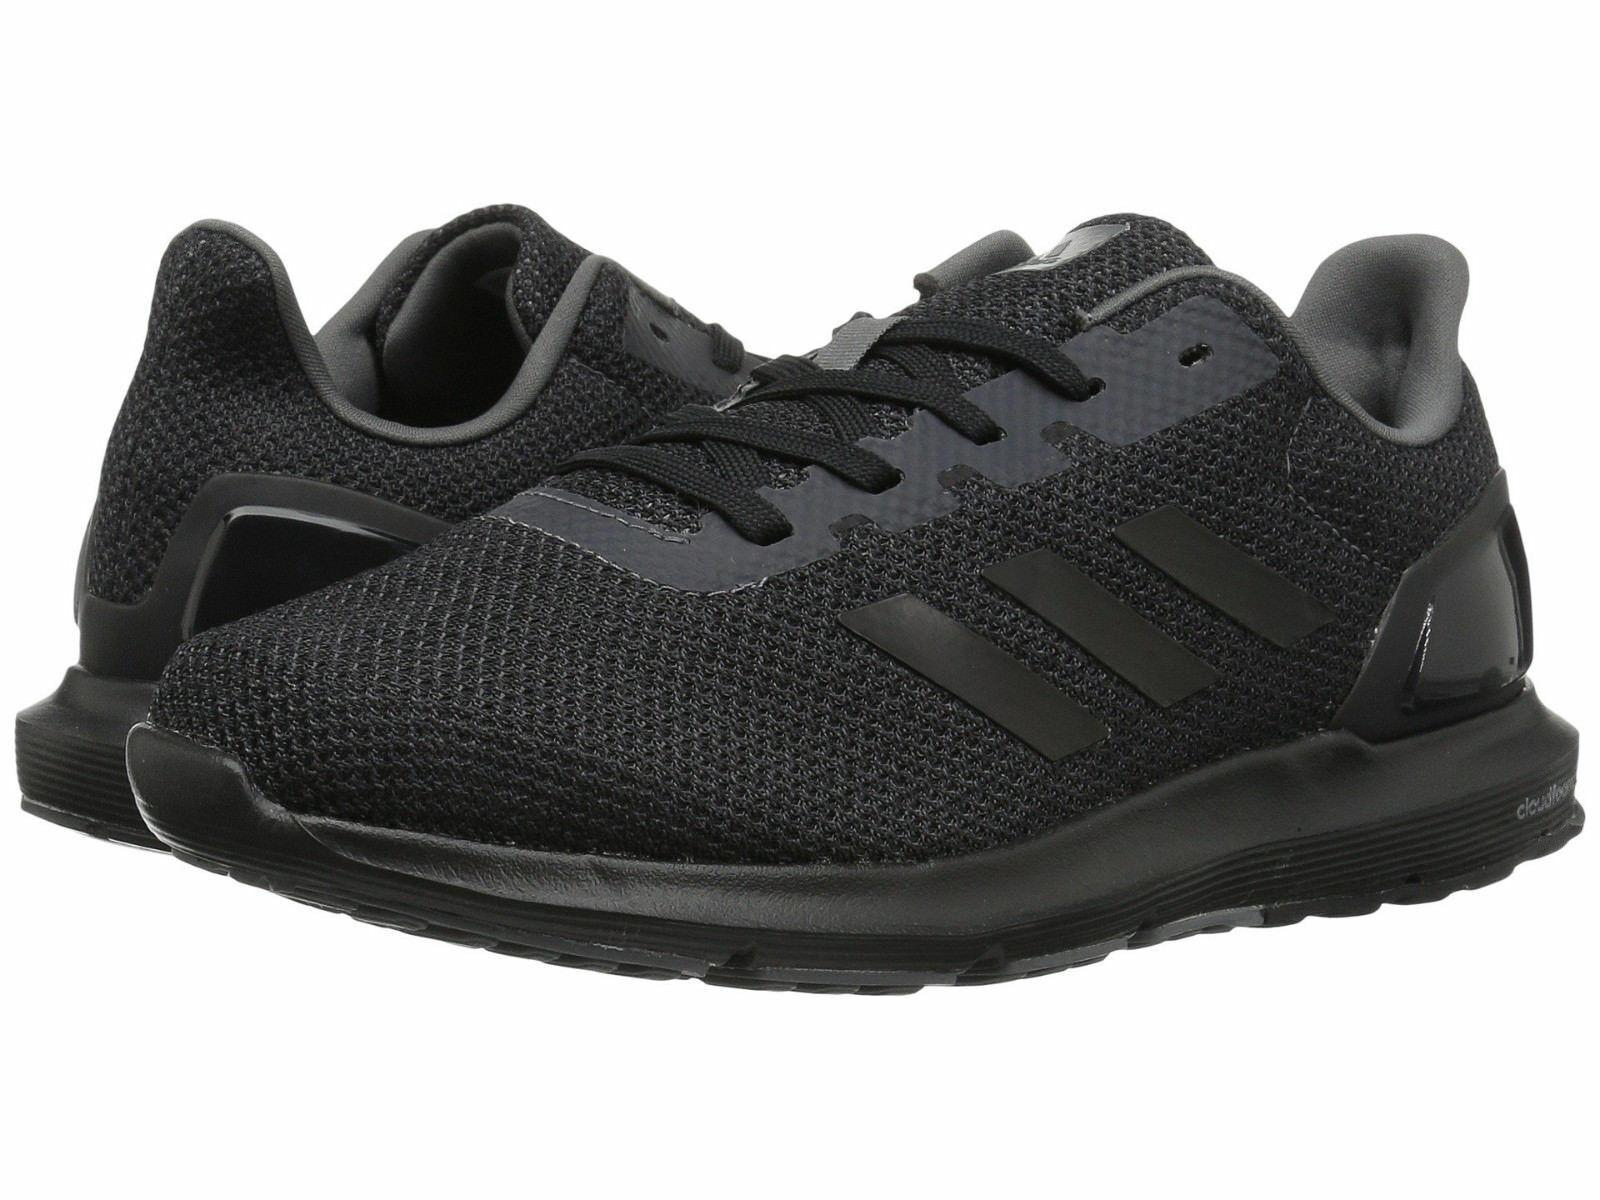 Men Adidas Cosmic 2 SL Running Mesh Upper CQ1711 Black Black 100% Authentic New